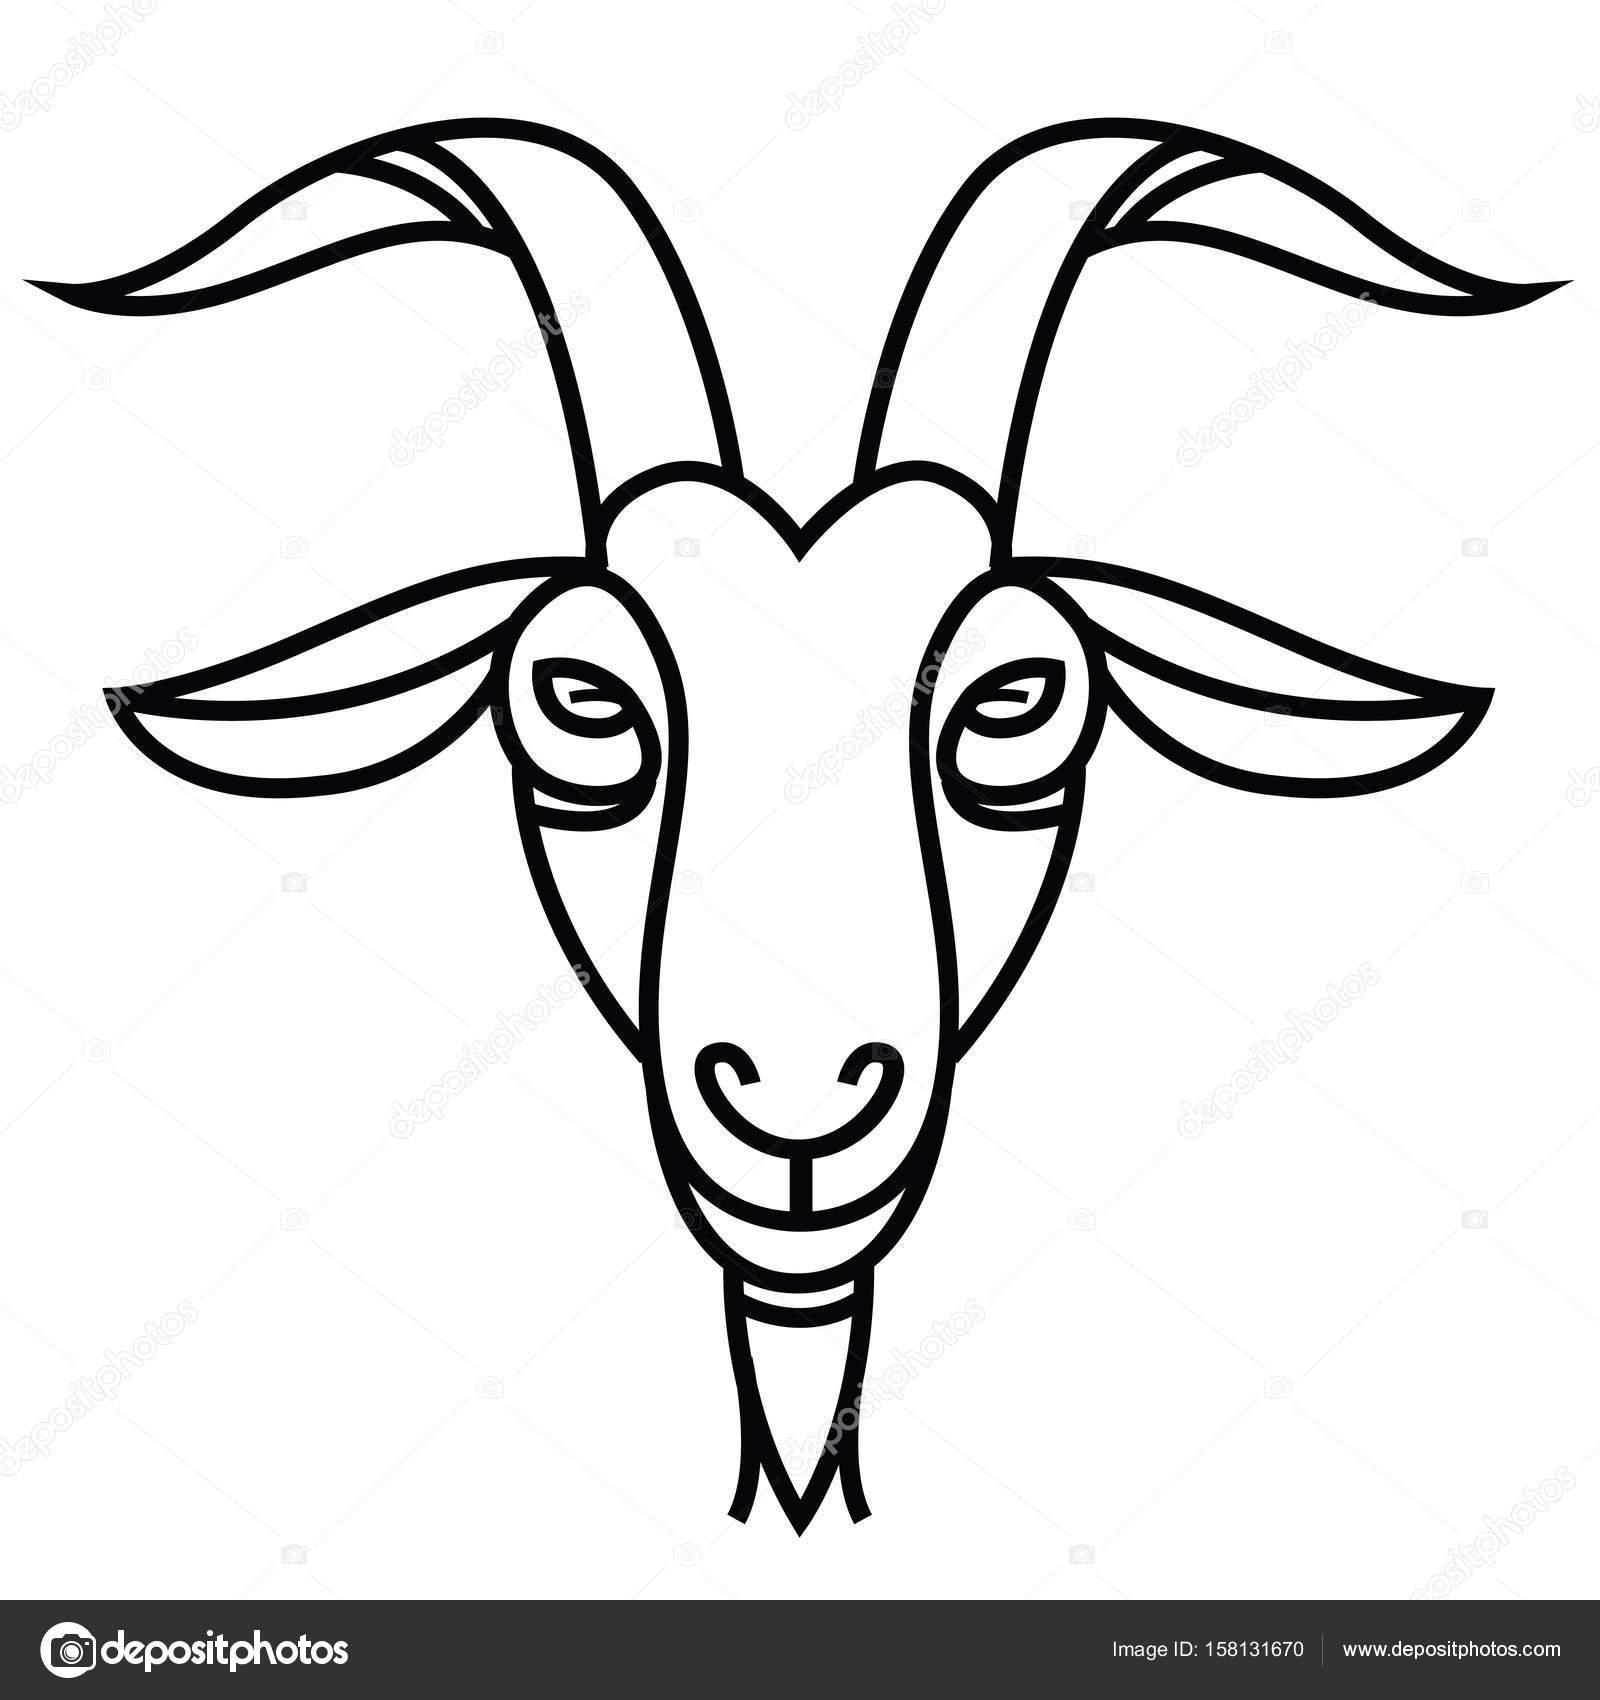 1600x1700 Linear Stylized Drawing Goat's Head Stock Vector Annasuchkova